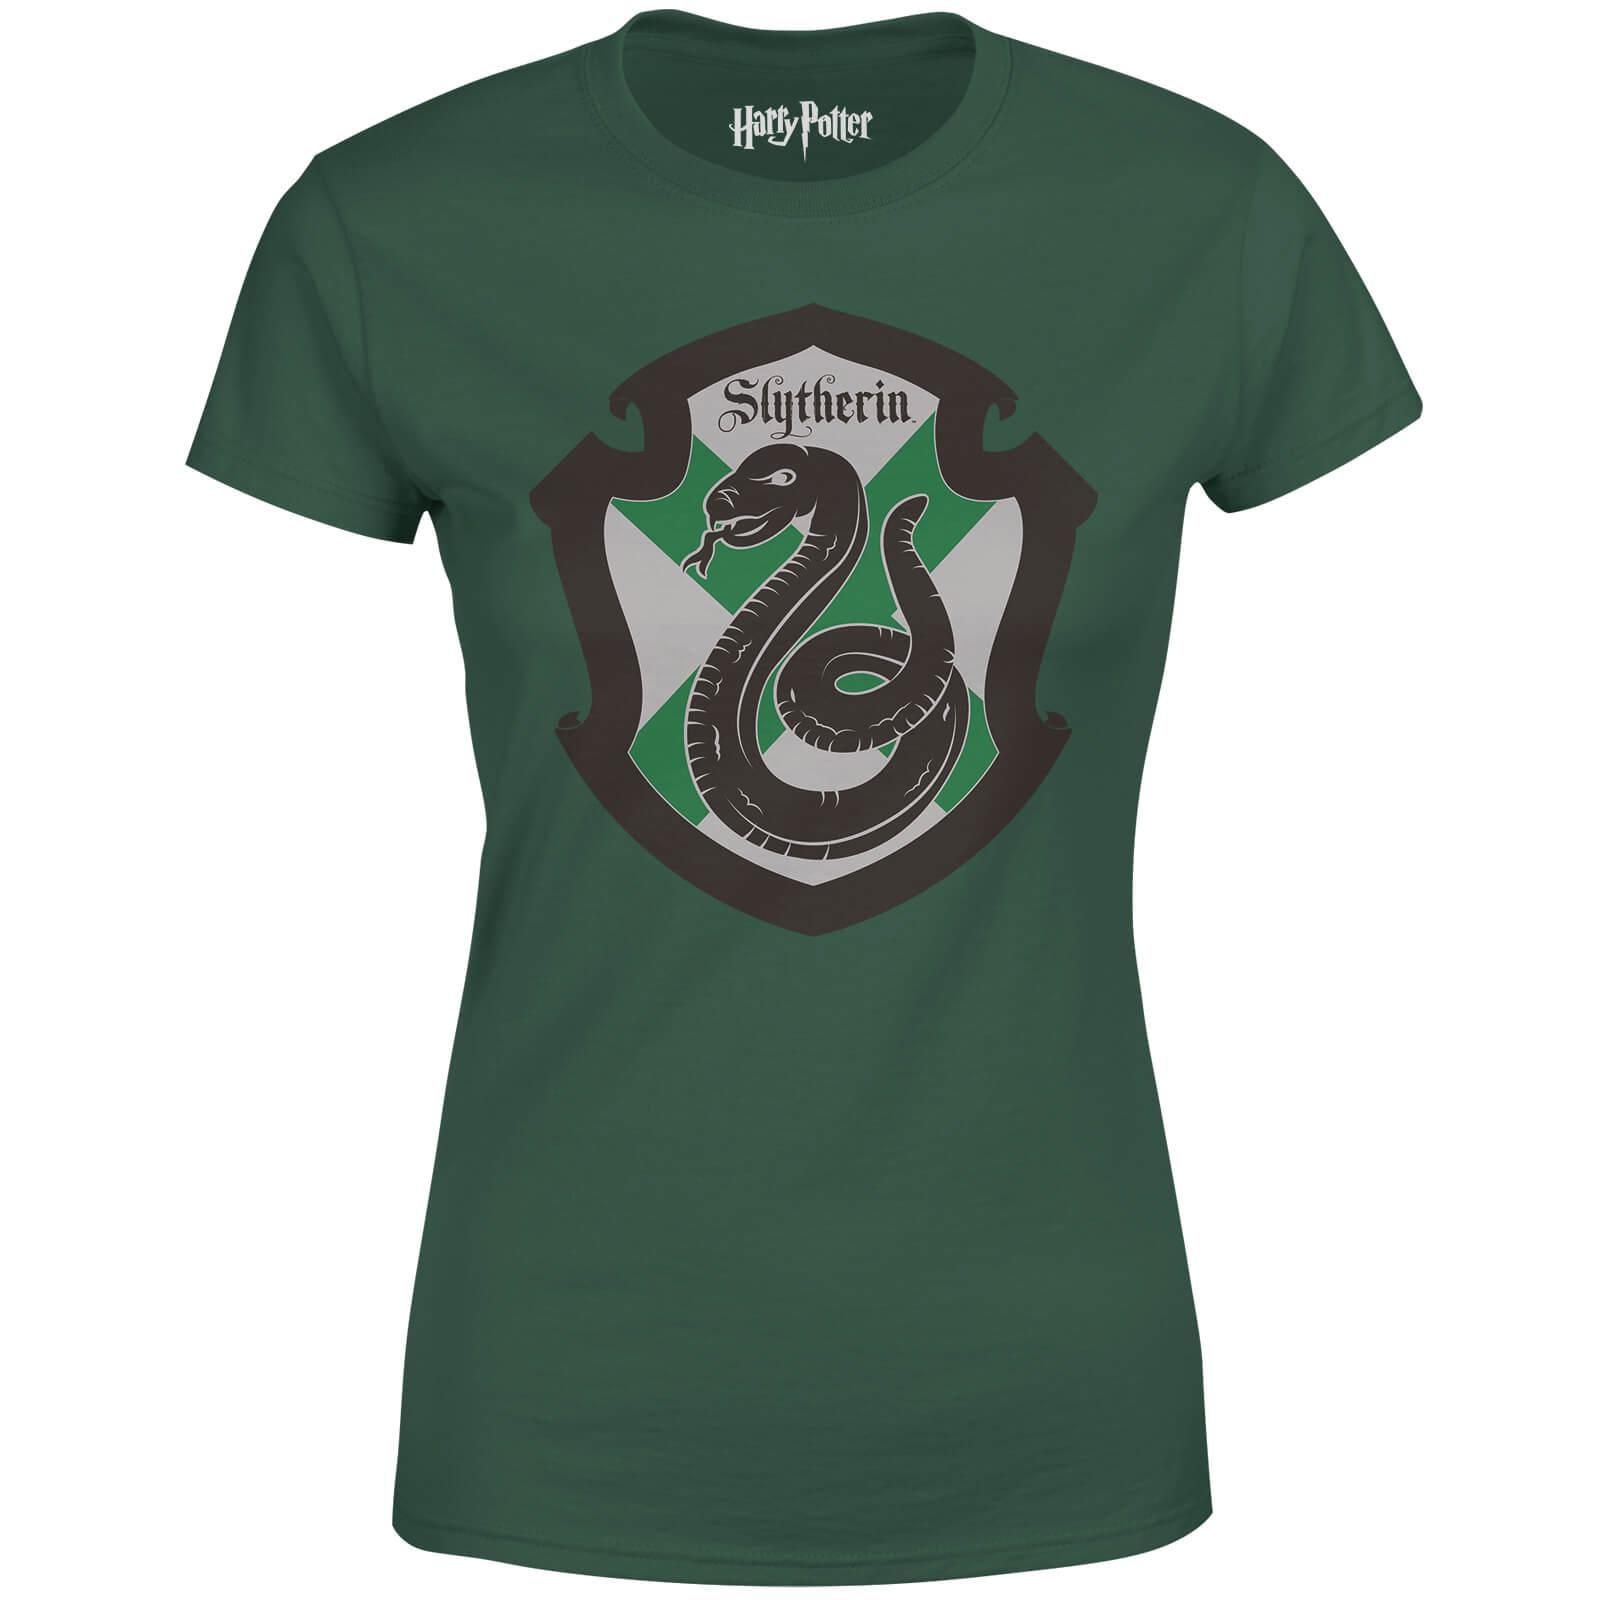 Harry Potter Slytherin House Green Women s T-Shirt Clothing  692d2778d